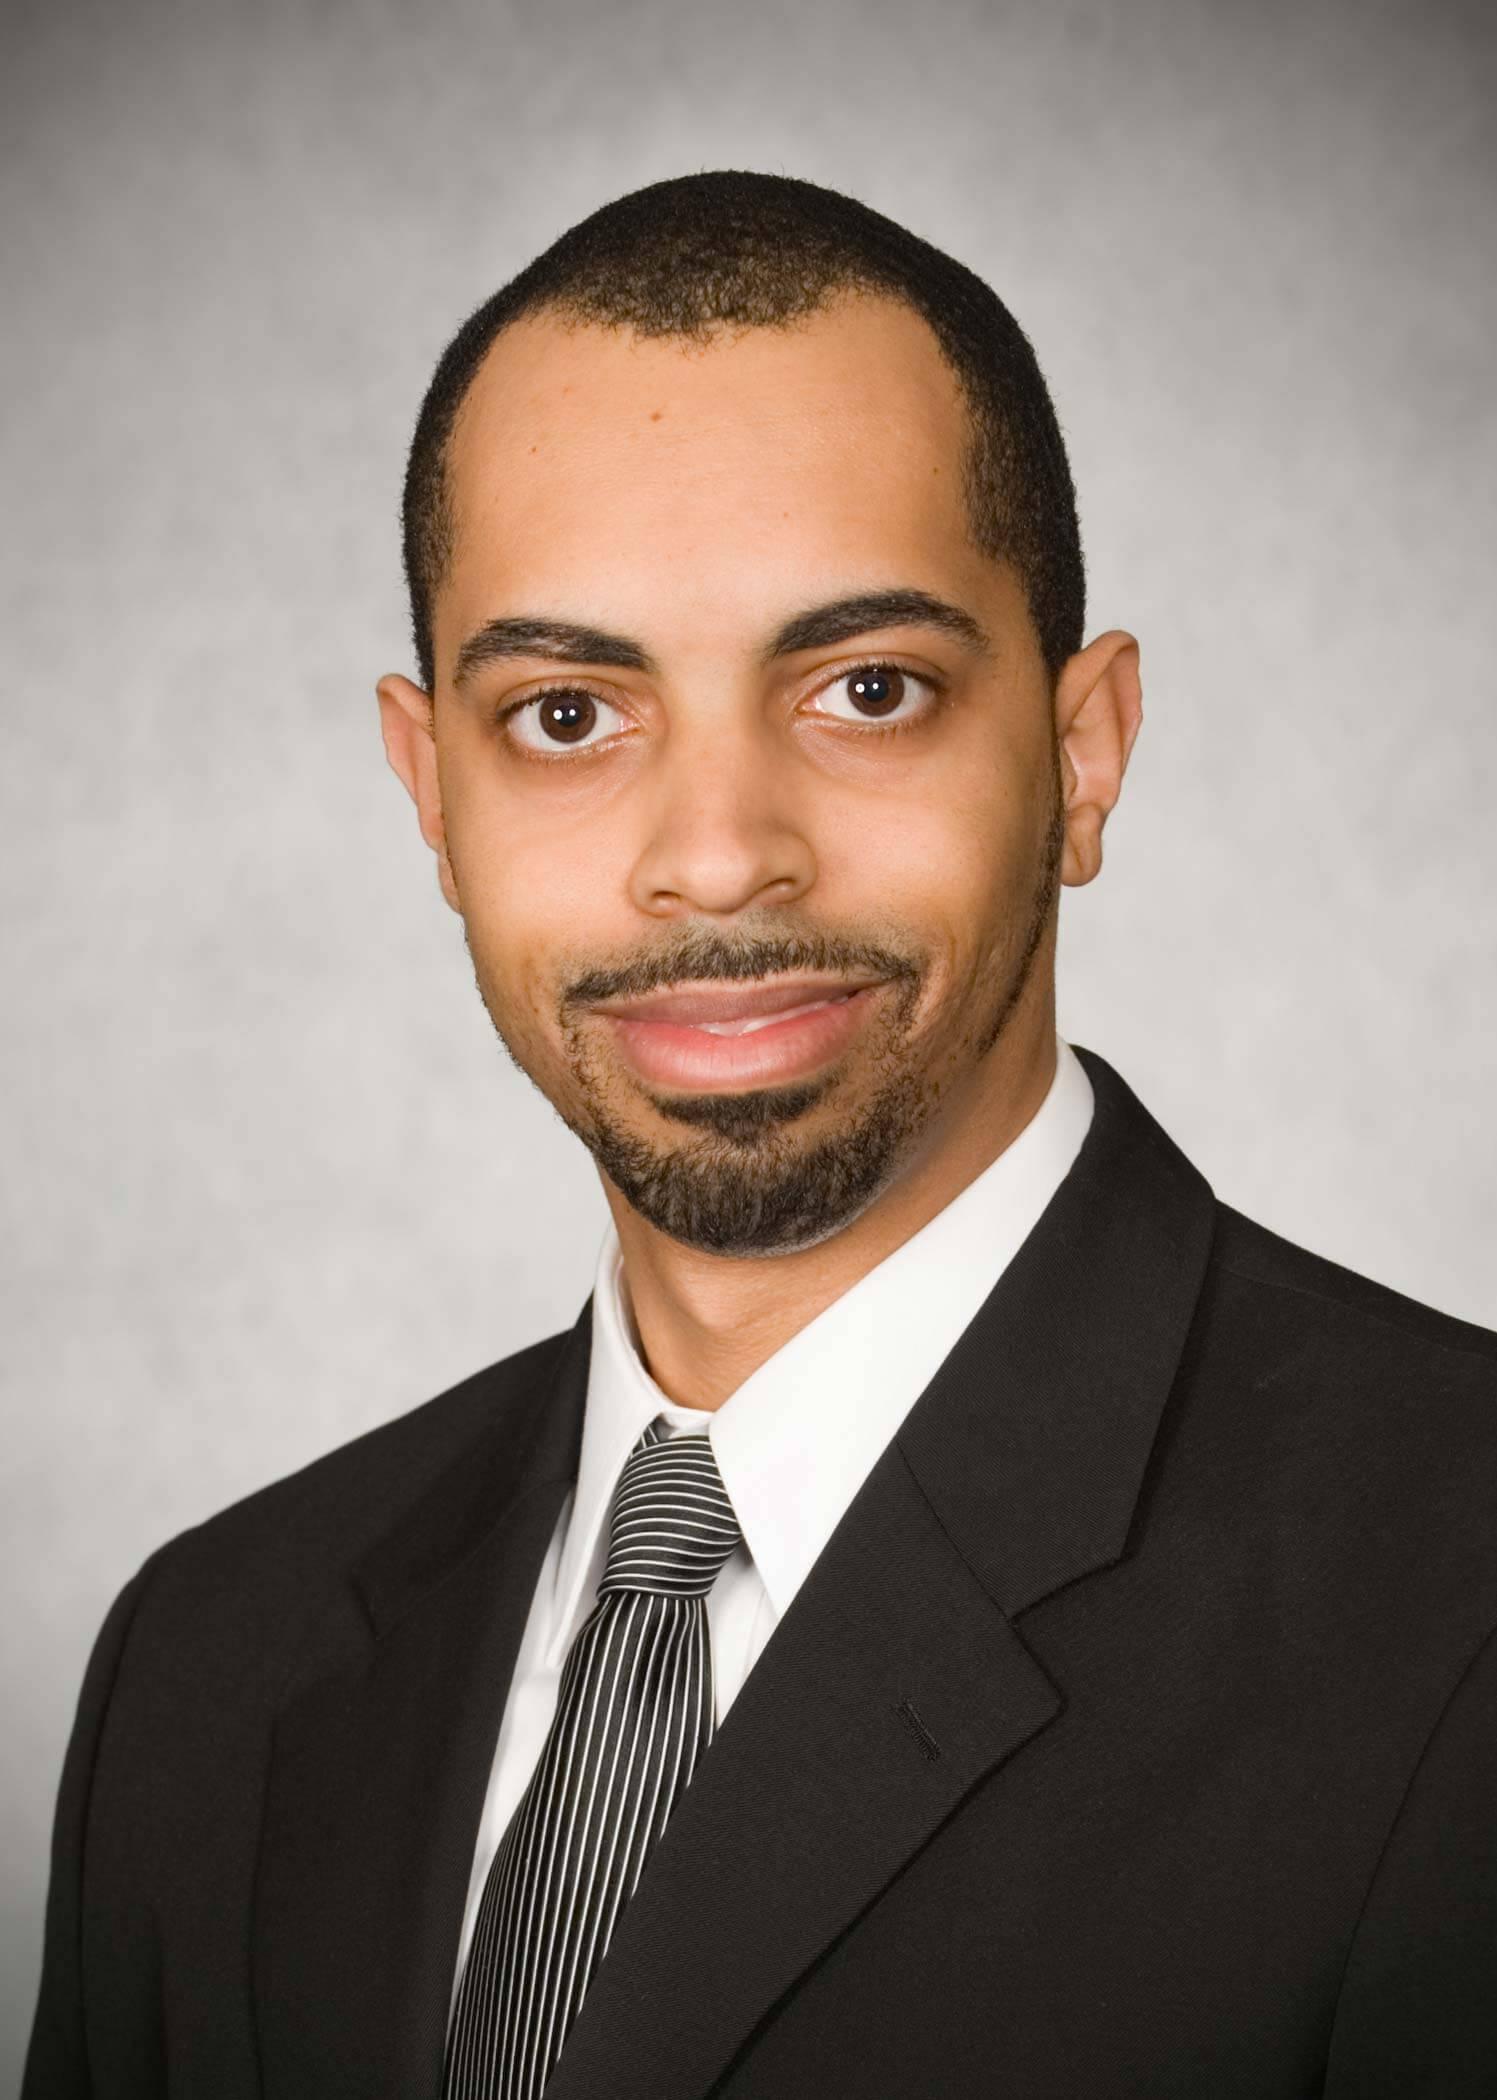 Third Year Law Student James Randolph Farris III